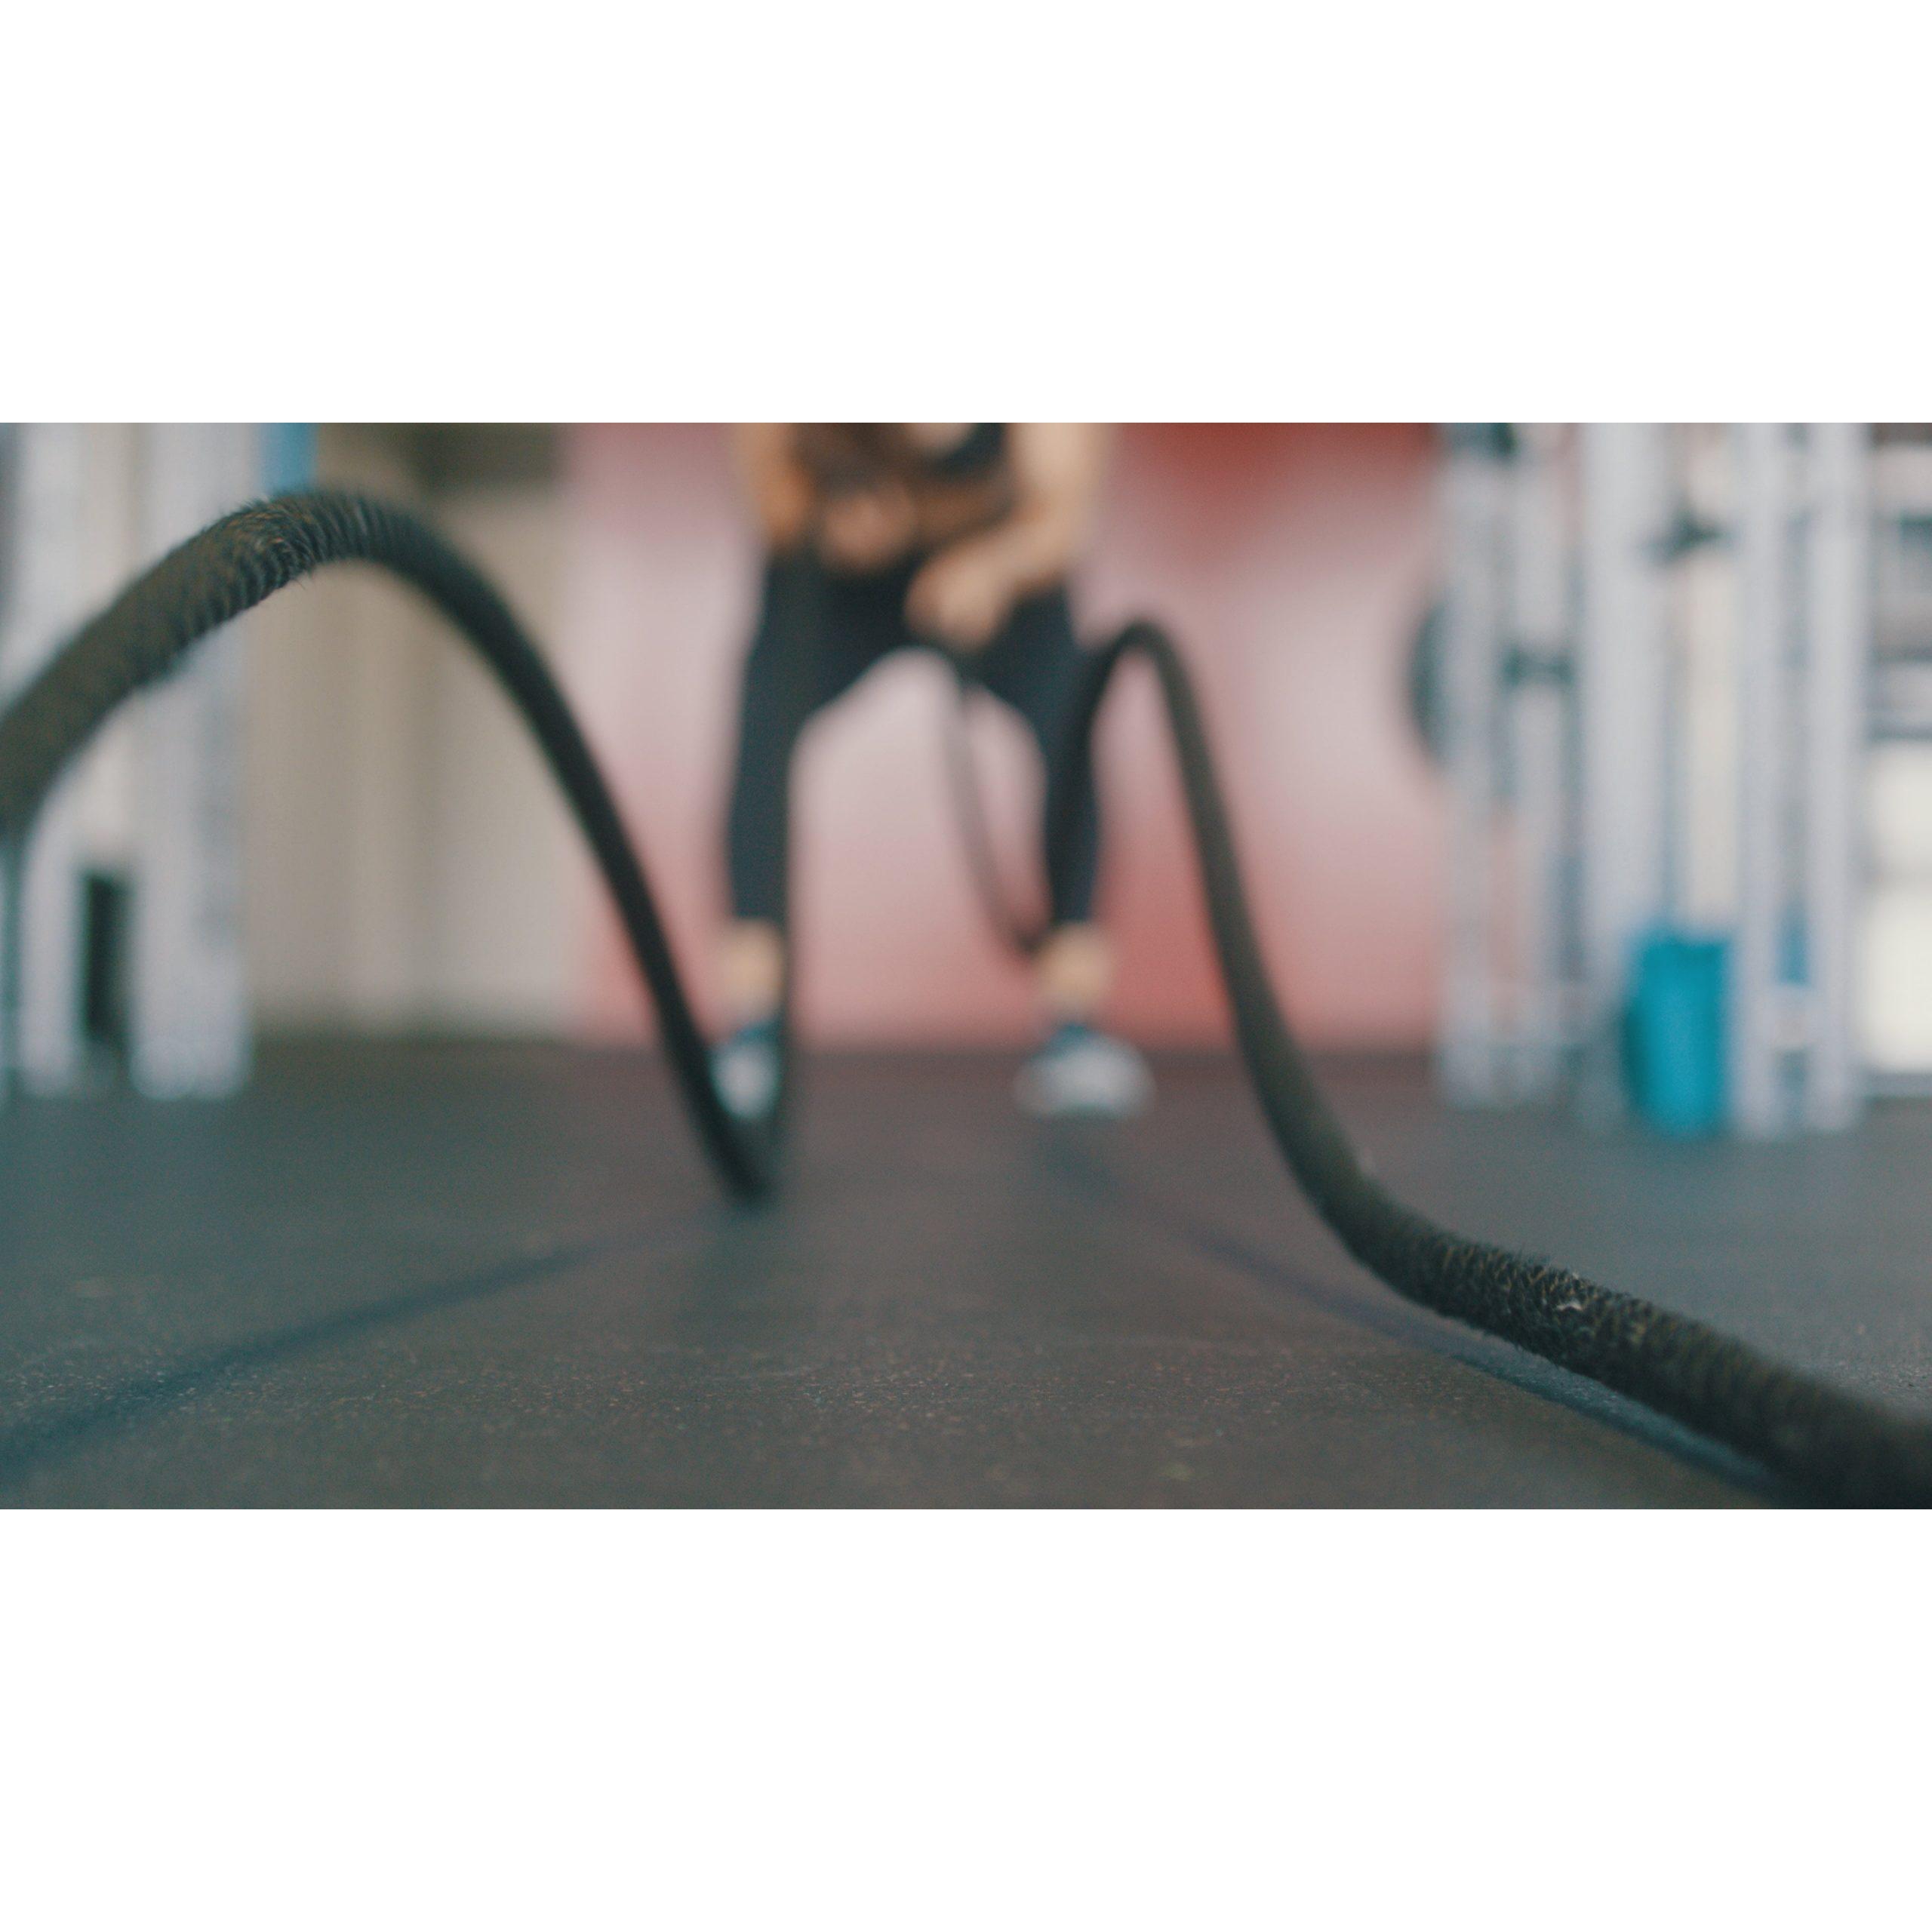 visoko intenzivna intervalna trenirovka hiit